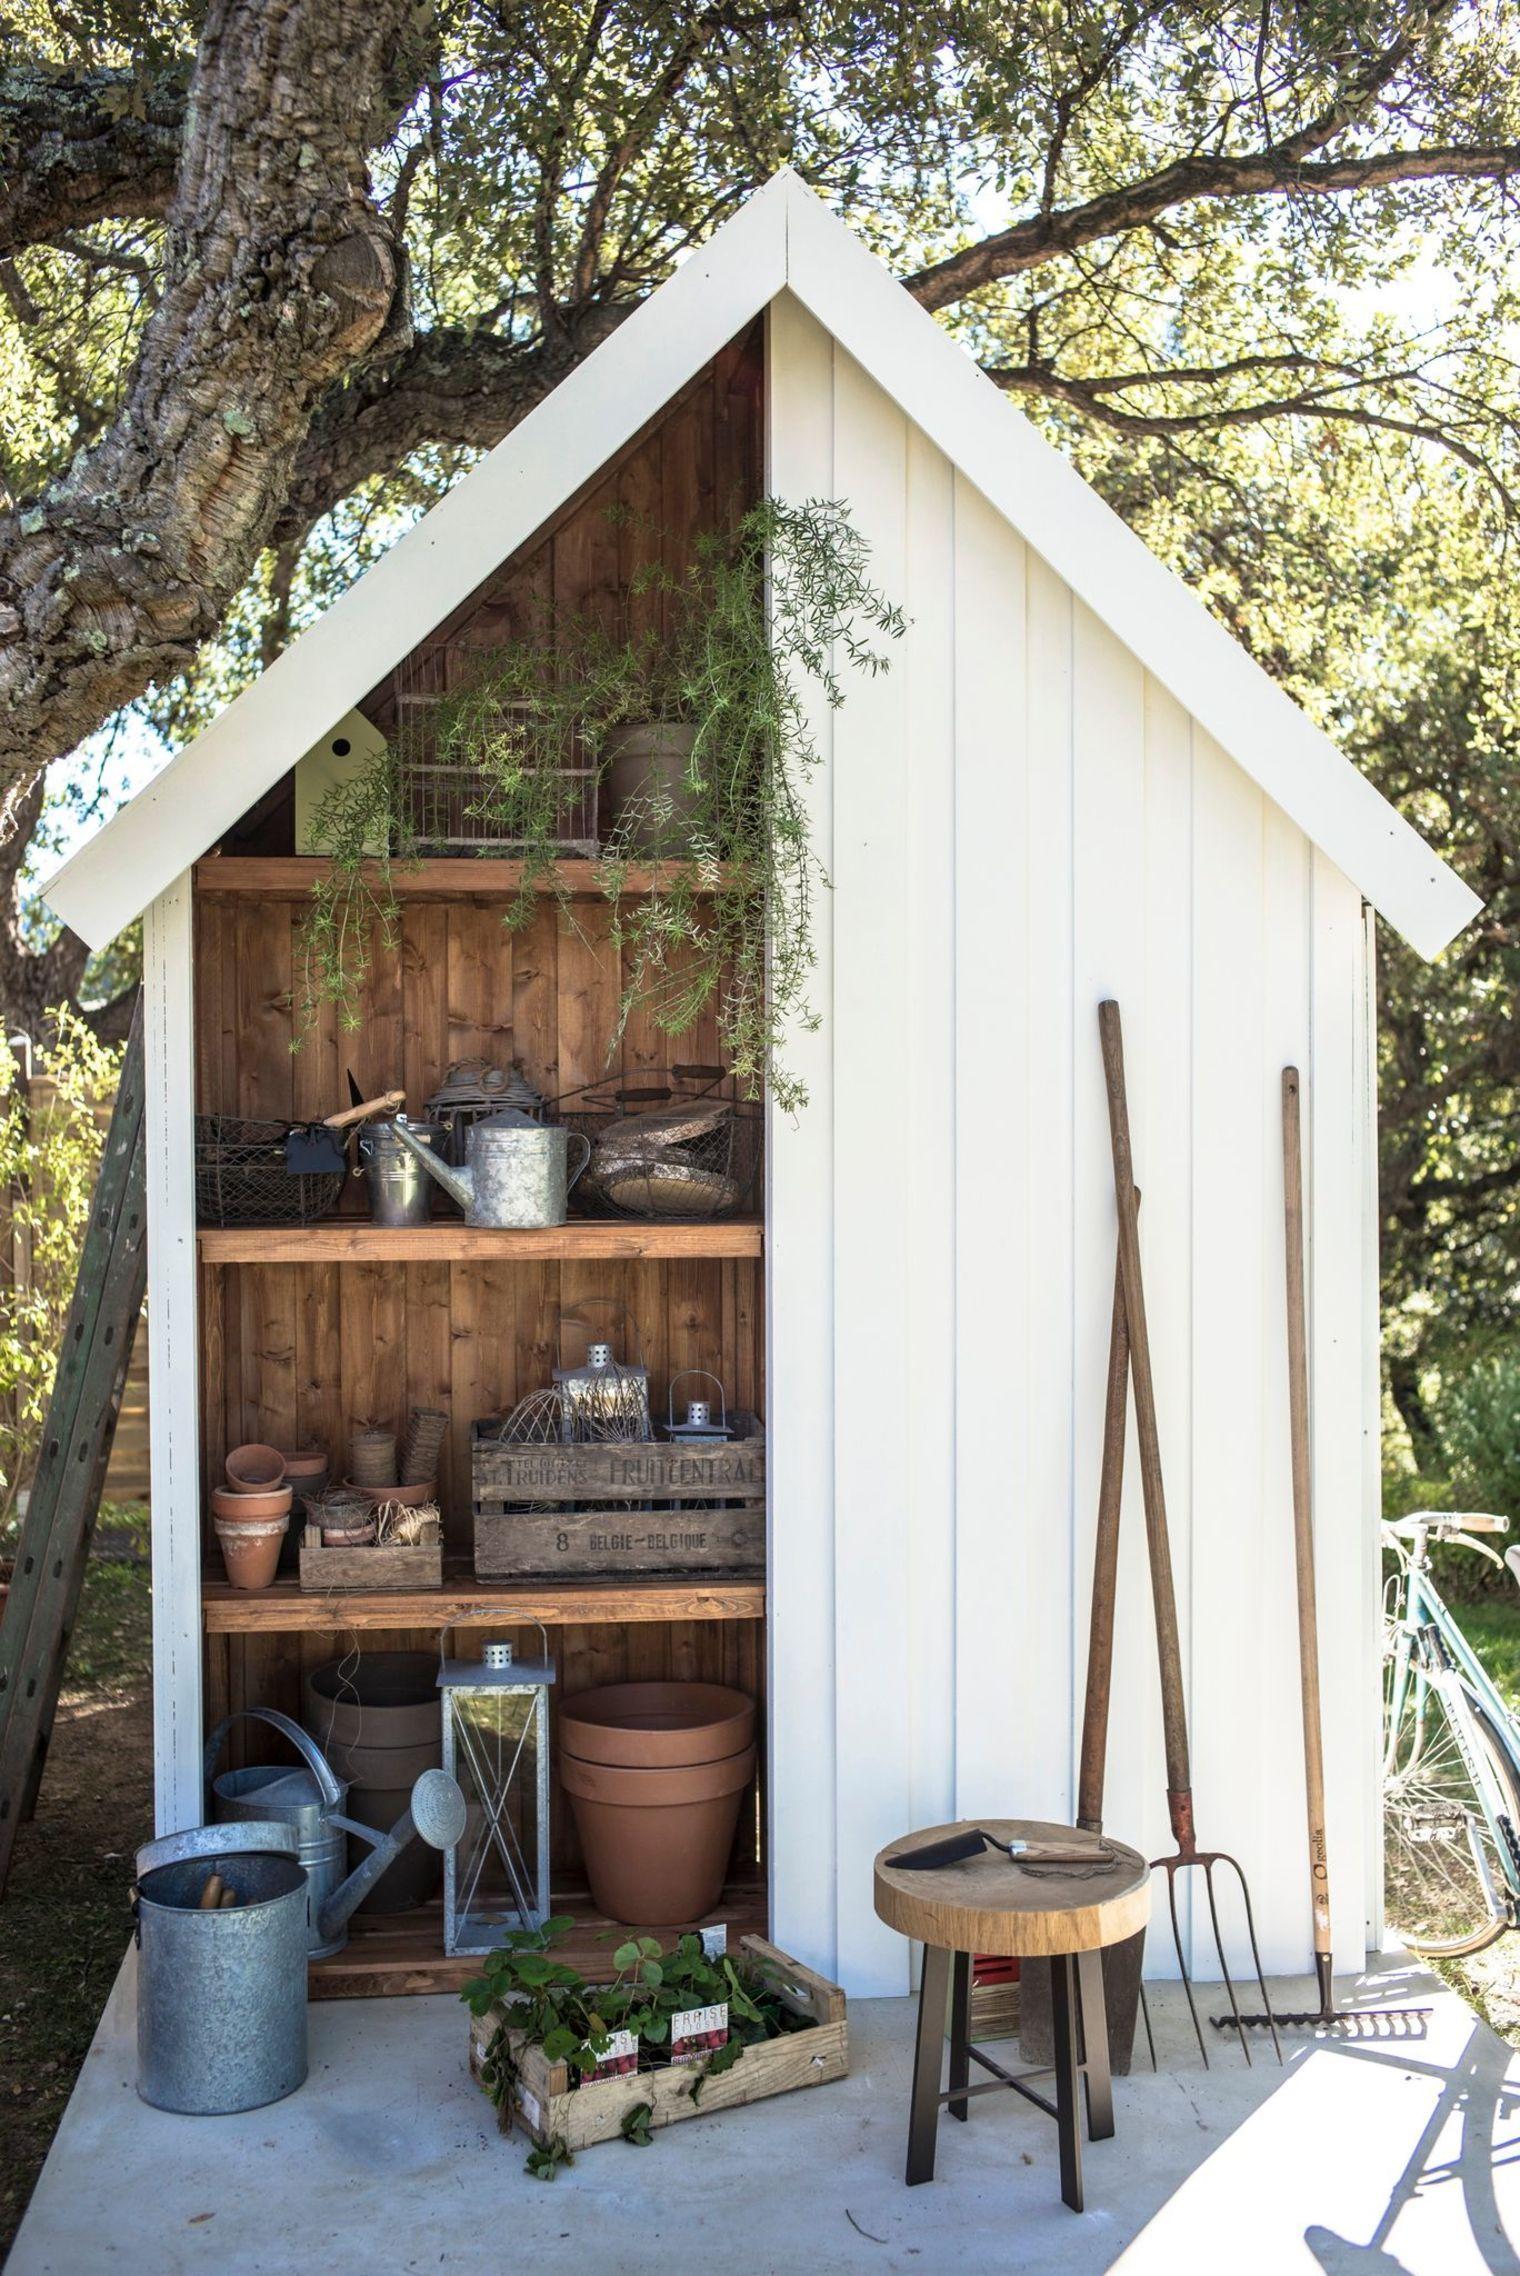 Abri de jardin bois, pvc, toit plat | Abris jardin | Abri de ...